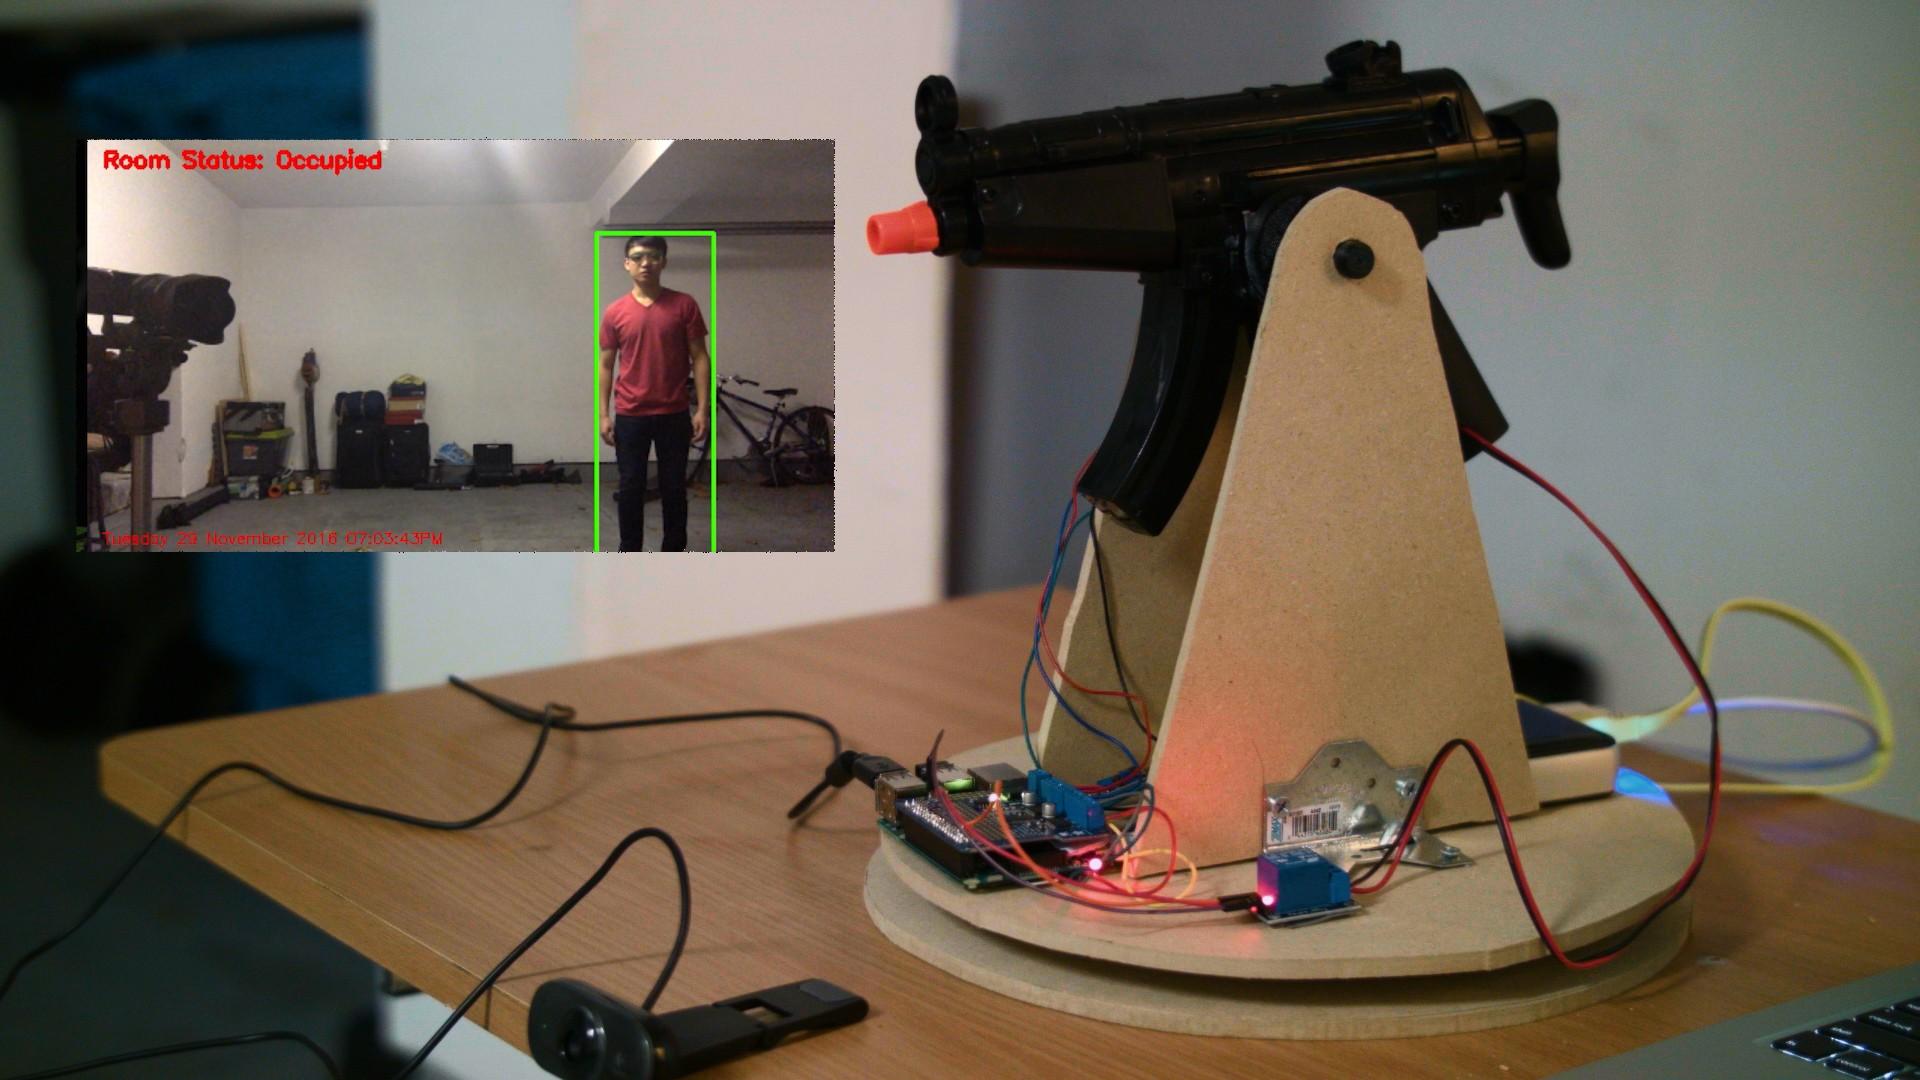 Pistola de Airsoft controlada con Raspberry Pi y OpenCV